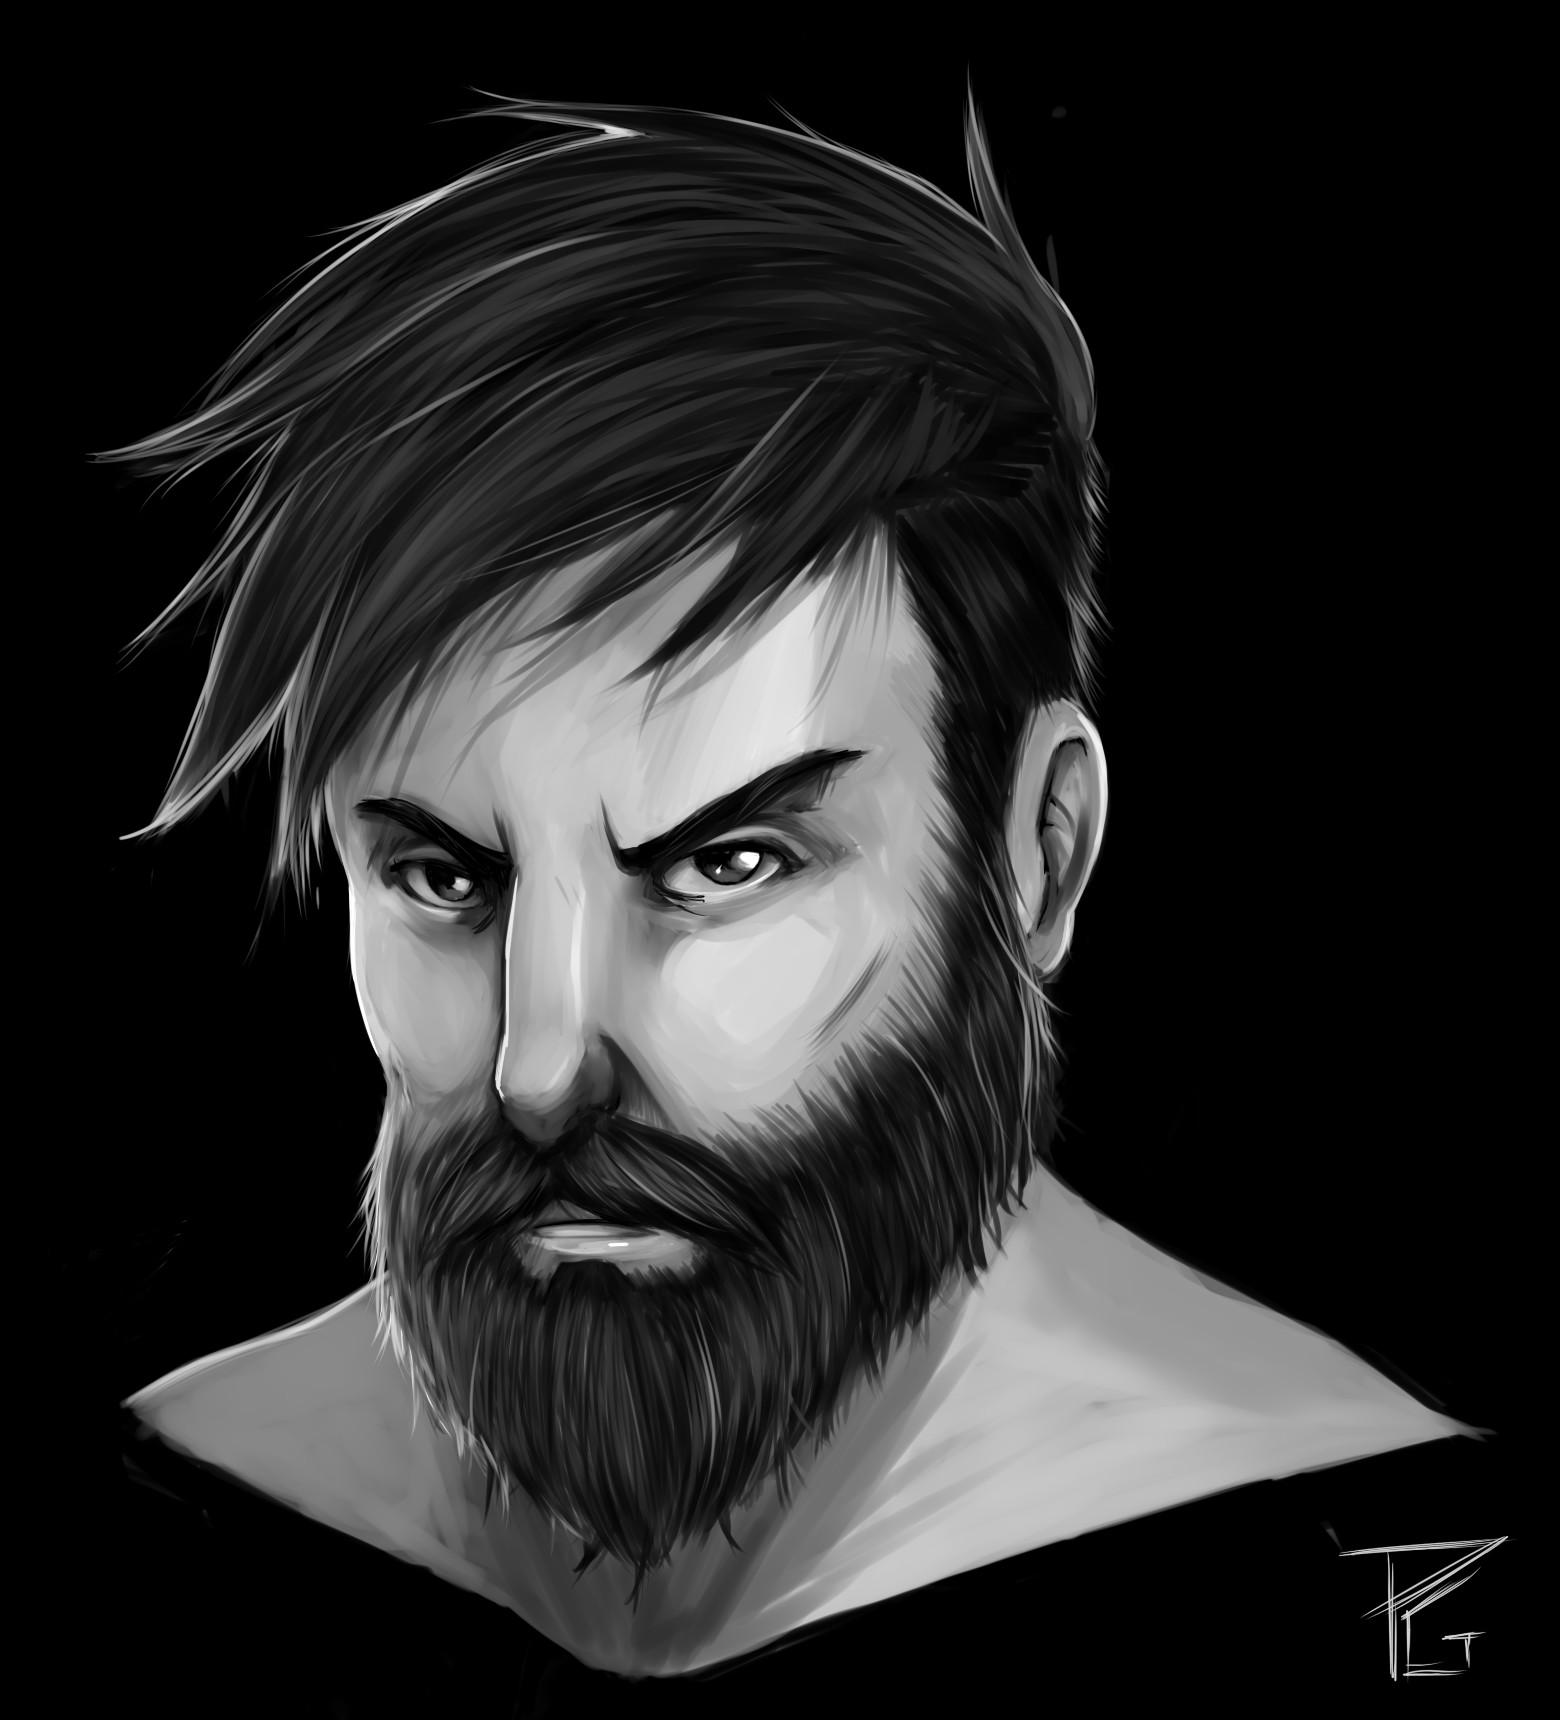 paulo gazola digital painting training beard guy